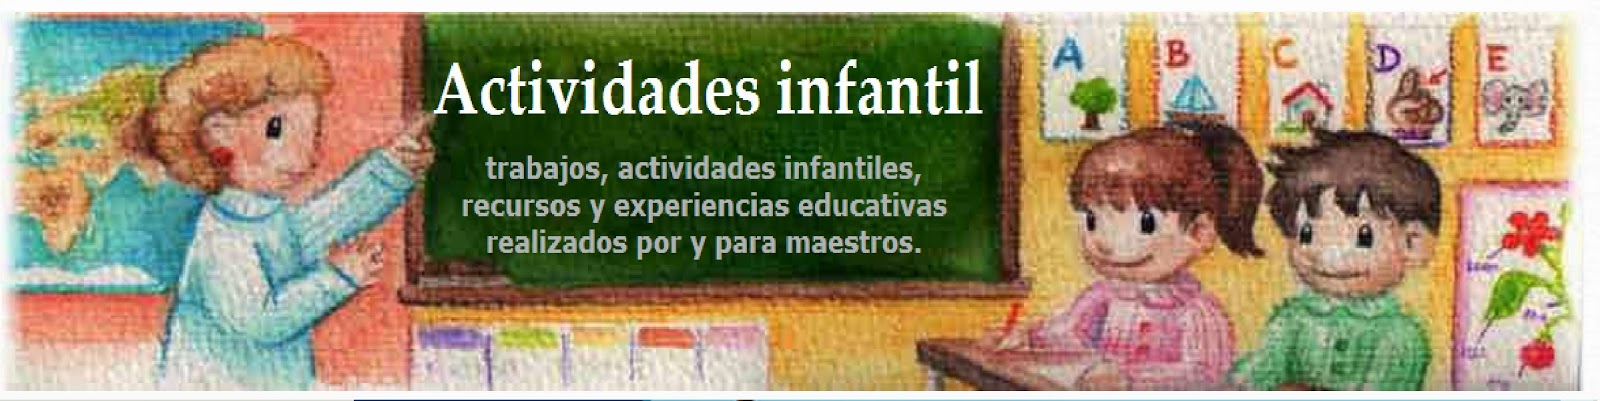 http://actividadesinfantil.com/archives/9550